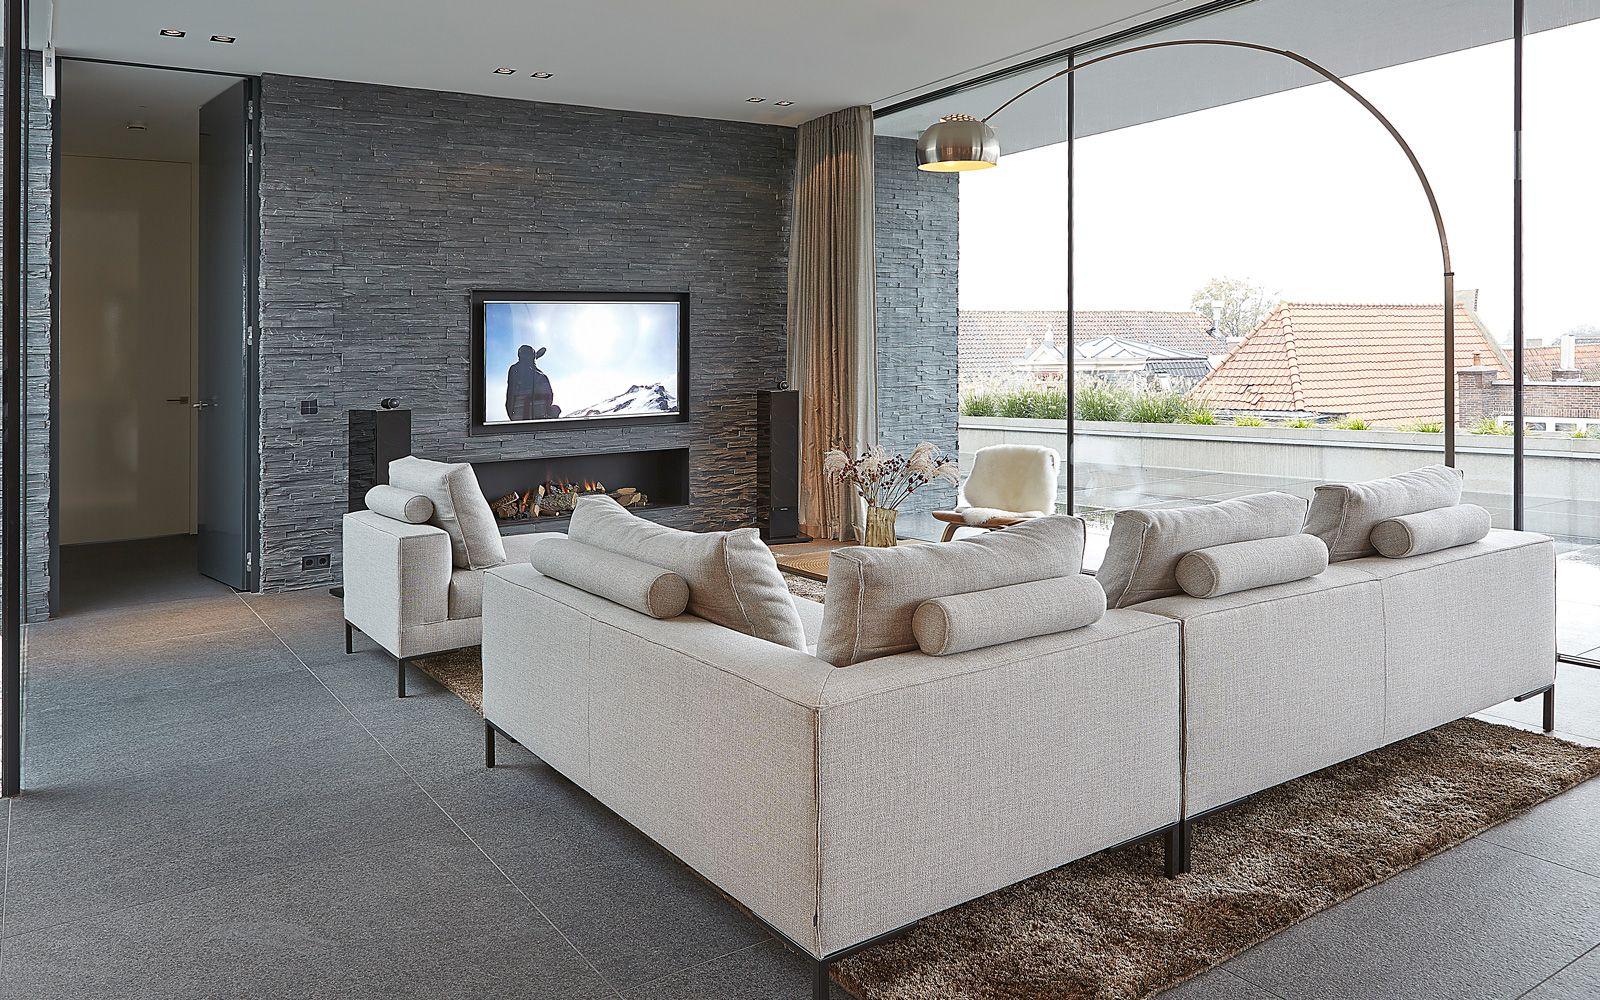 Interieur Strak Klassiek : Penthouses interieur theartofliving.eu pinterest luxury